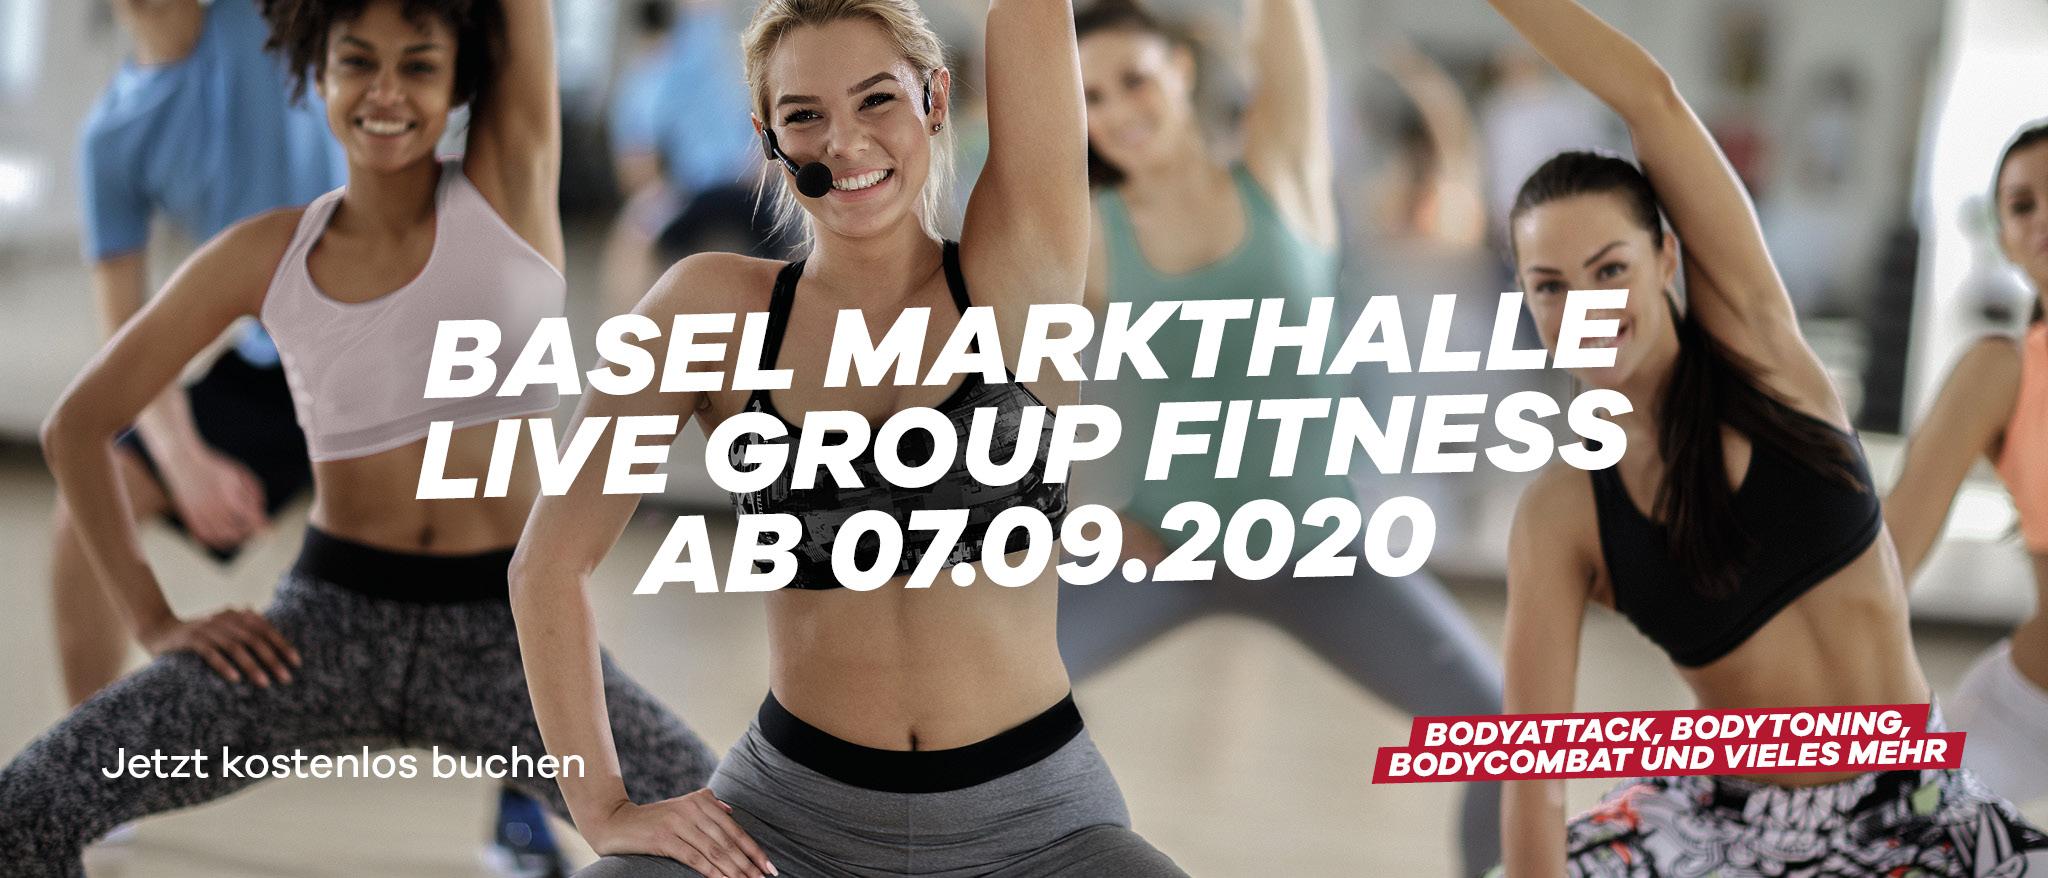 Group Fitness Live Basel Markthalle